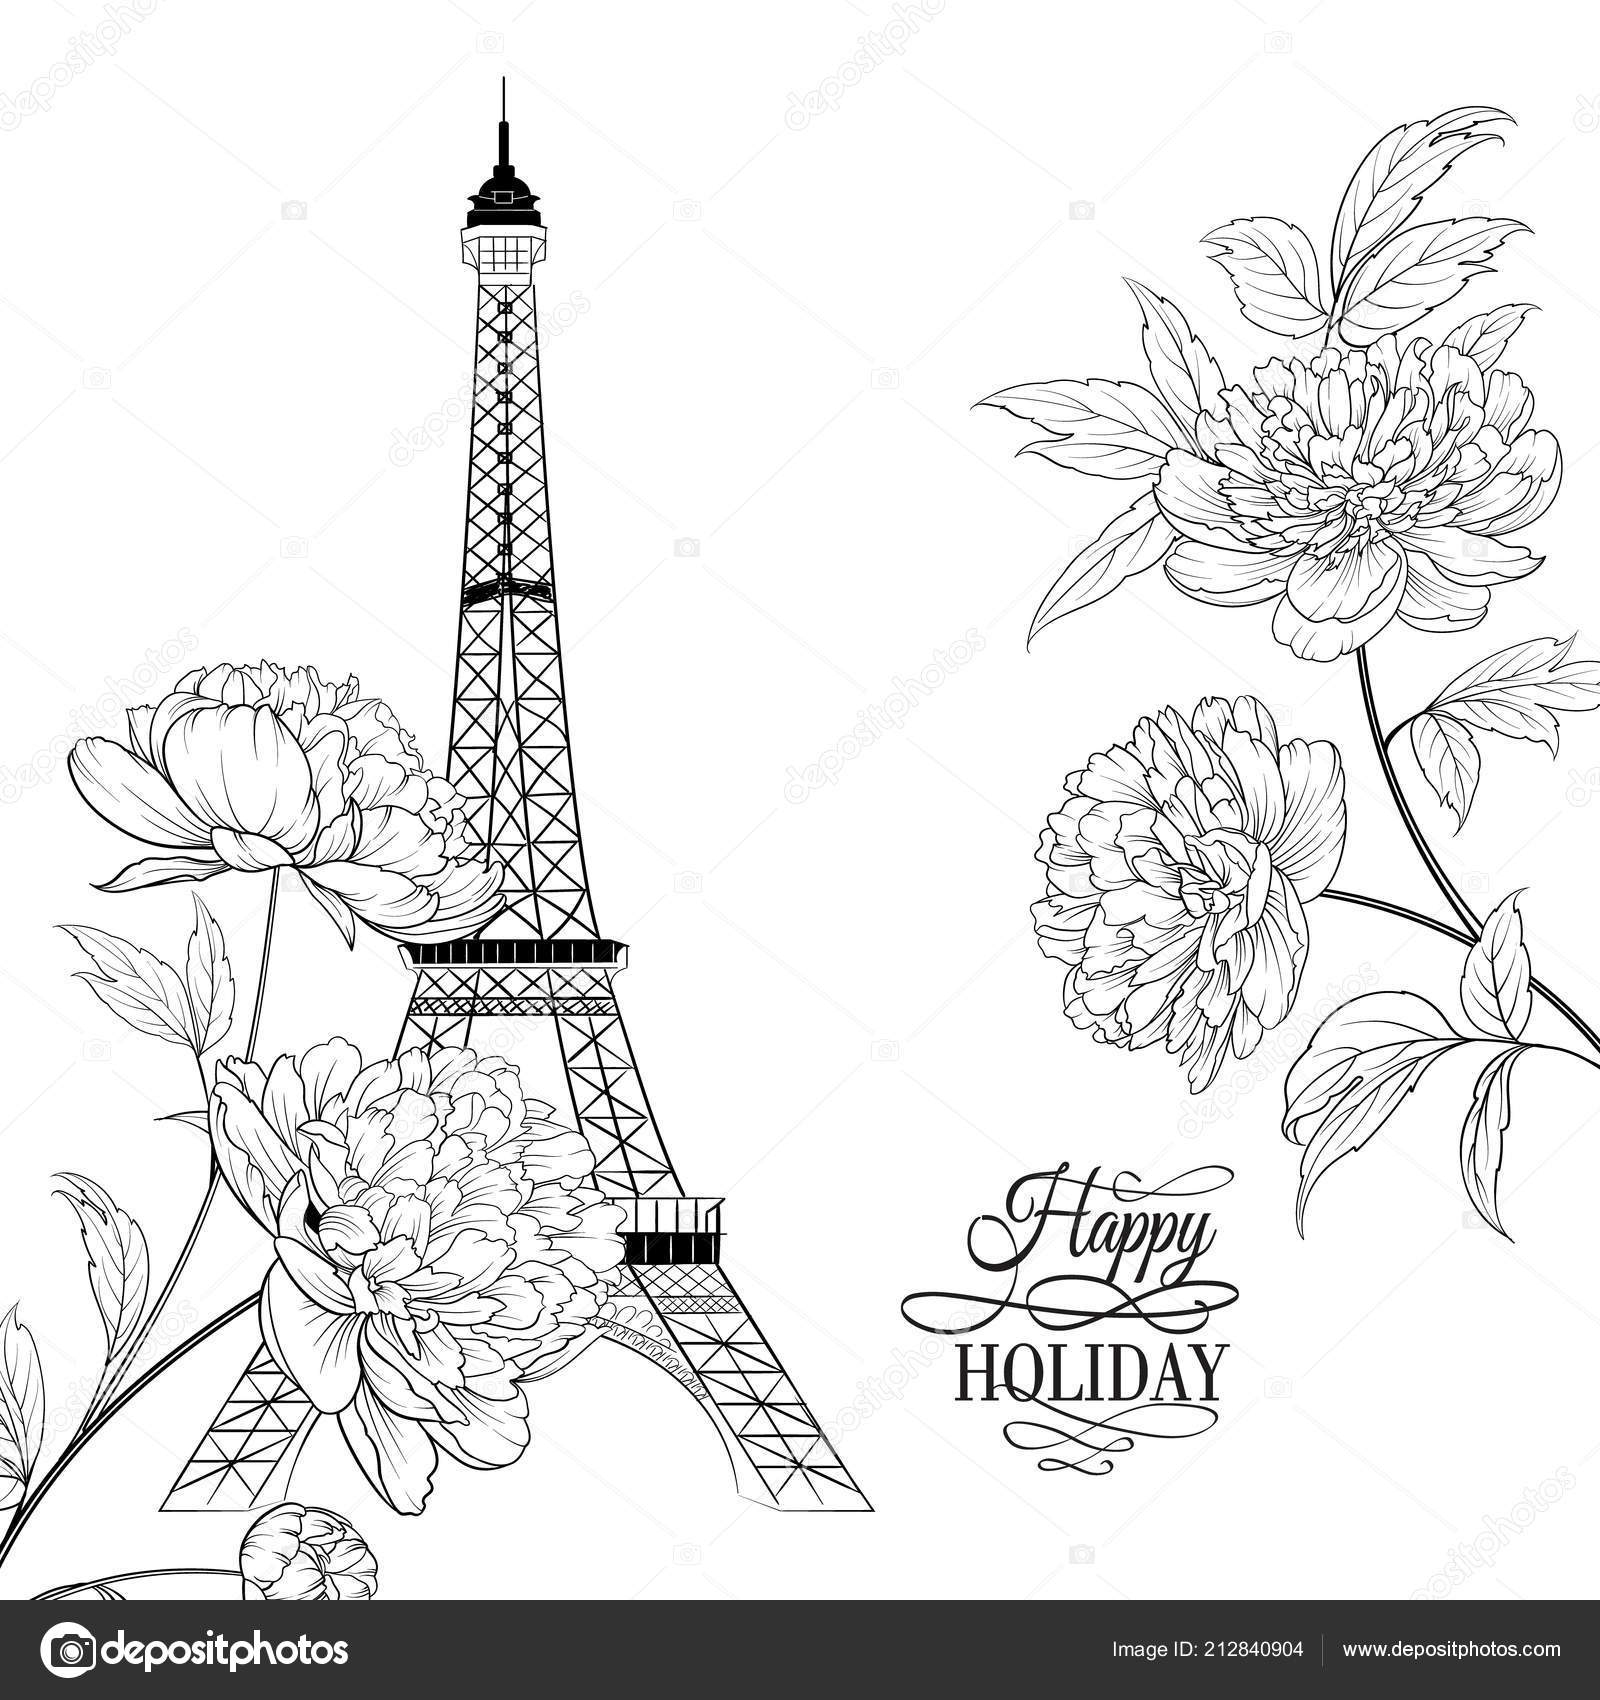 Eiffel Tower Wedding Invitations: Wedding Invitation Card Template. Eiffel Tower Simbol With